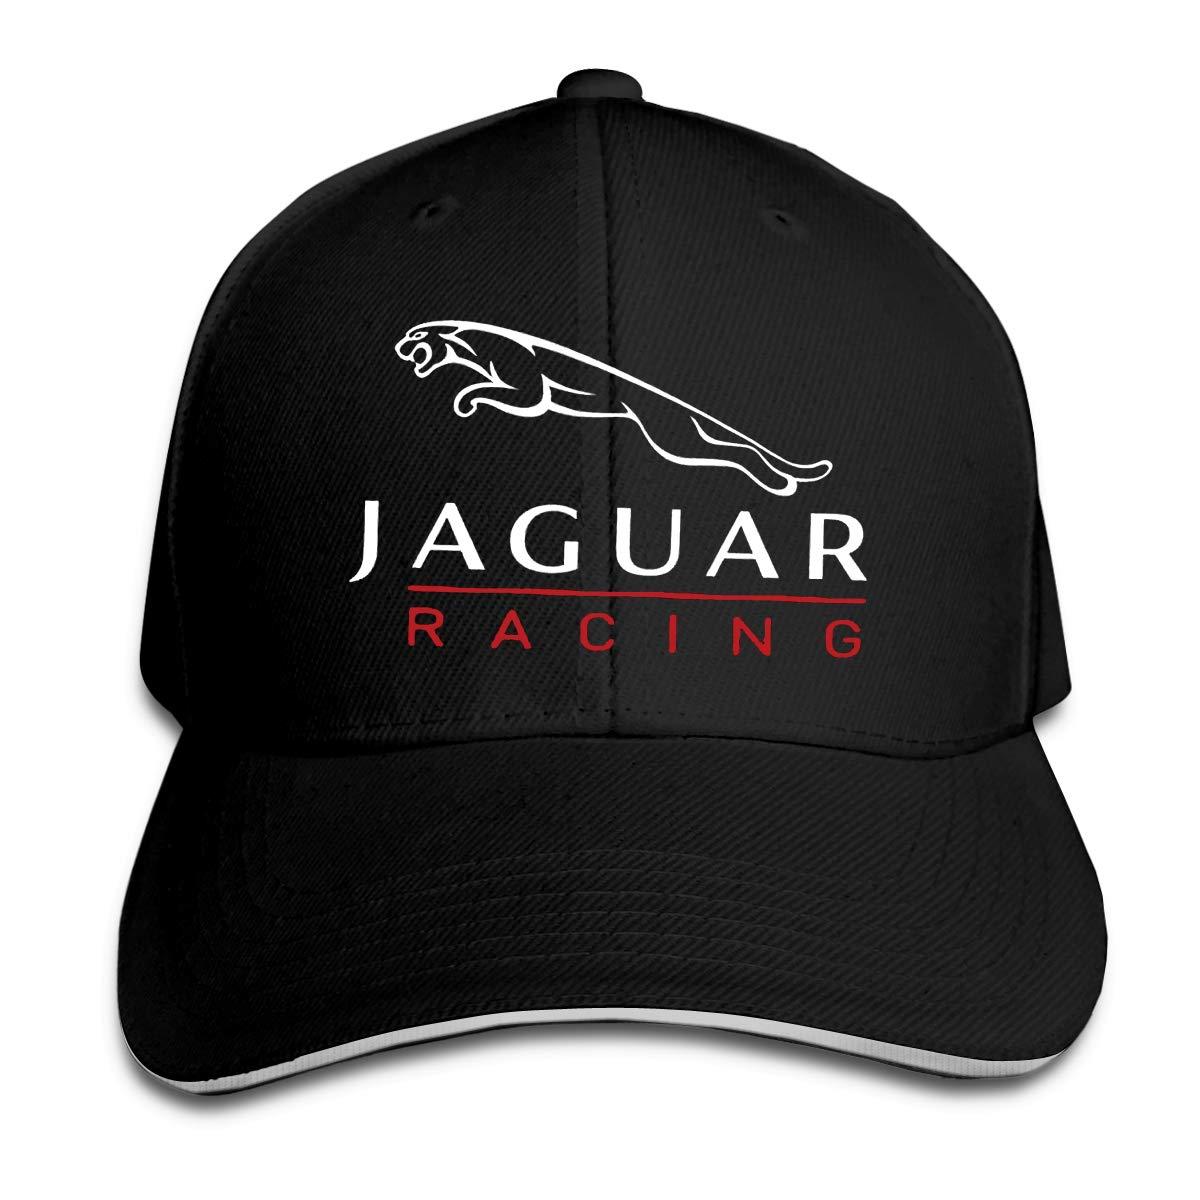 Jaguar Car Racing Brand Logo Visor Hat Vintage Sandwich Cap Caps